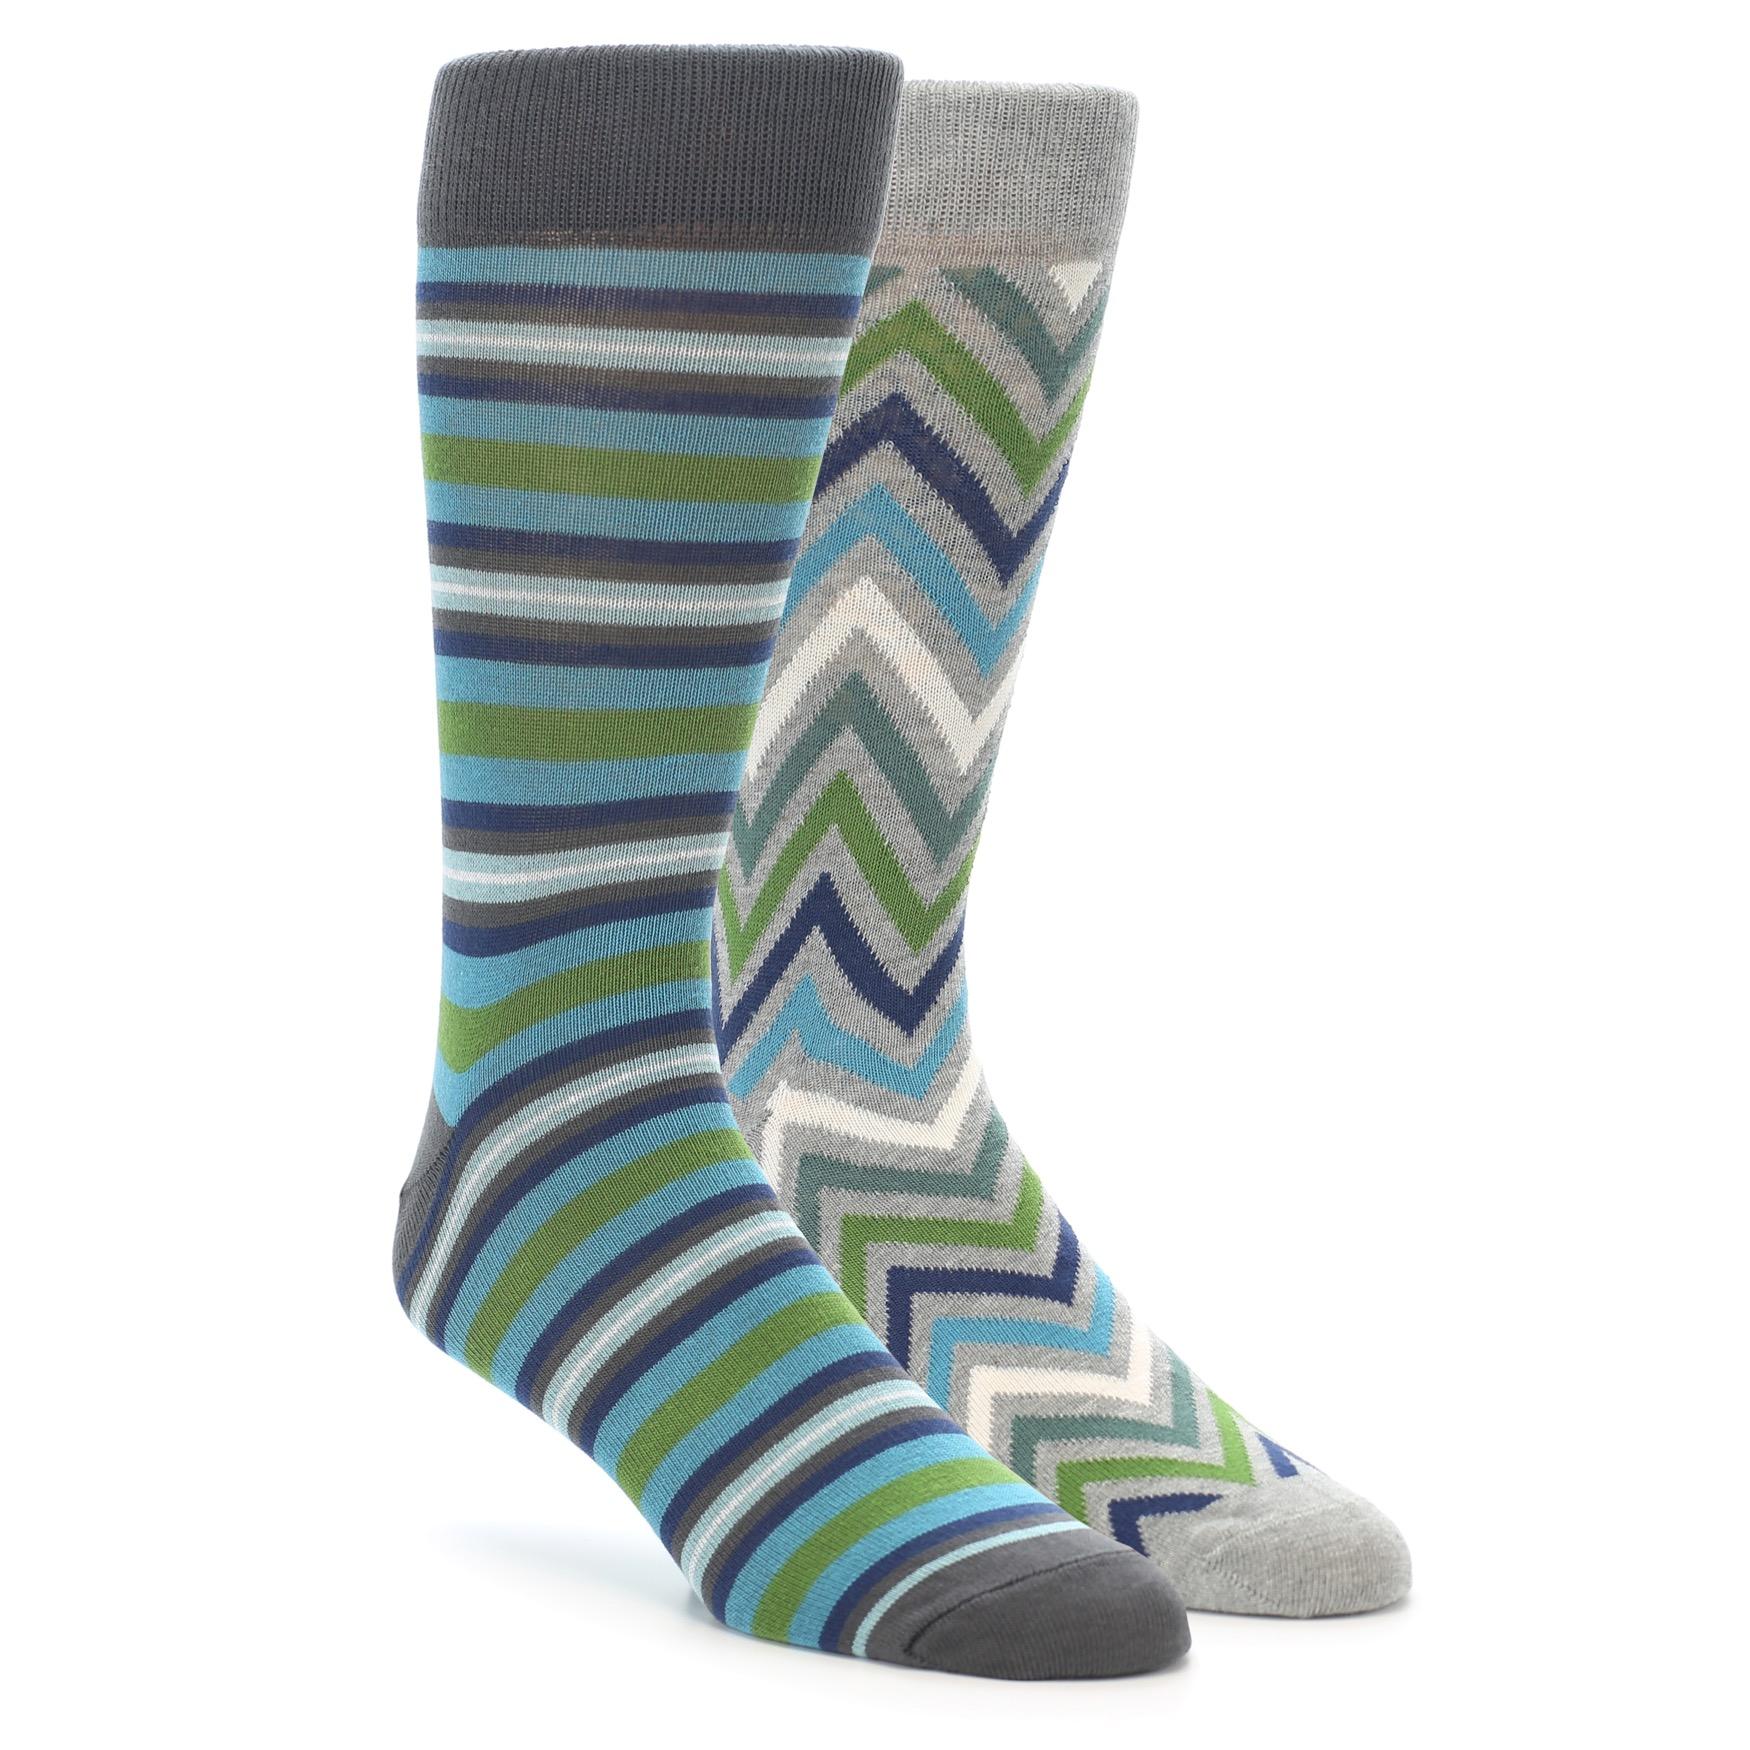 1d7c4cb1a0046 Grey Blue Green Stripe Men's Dress Socks 2 Pack   boldSOCKS